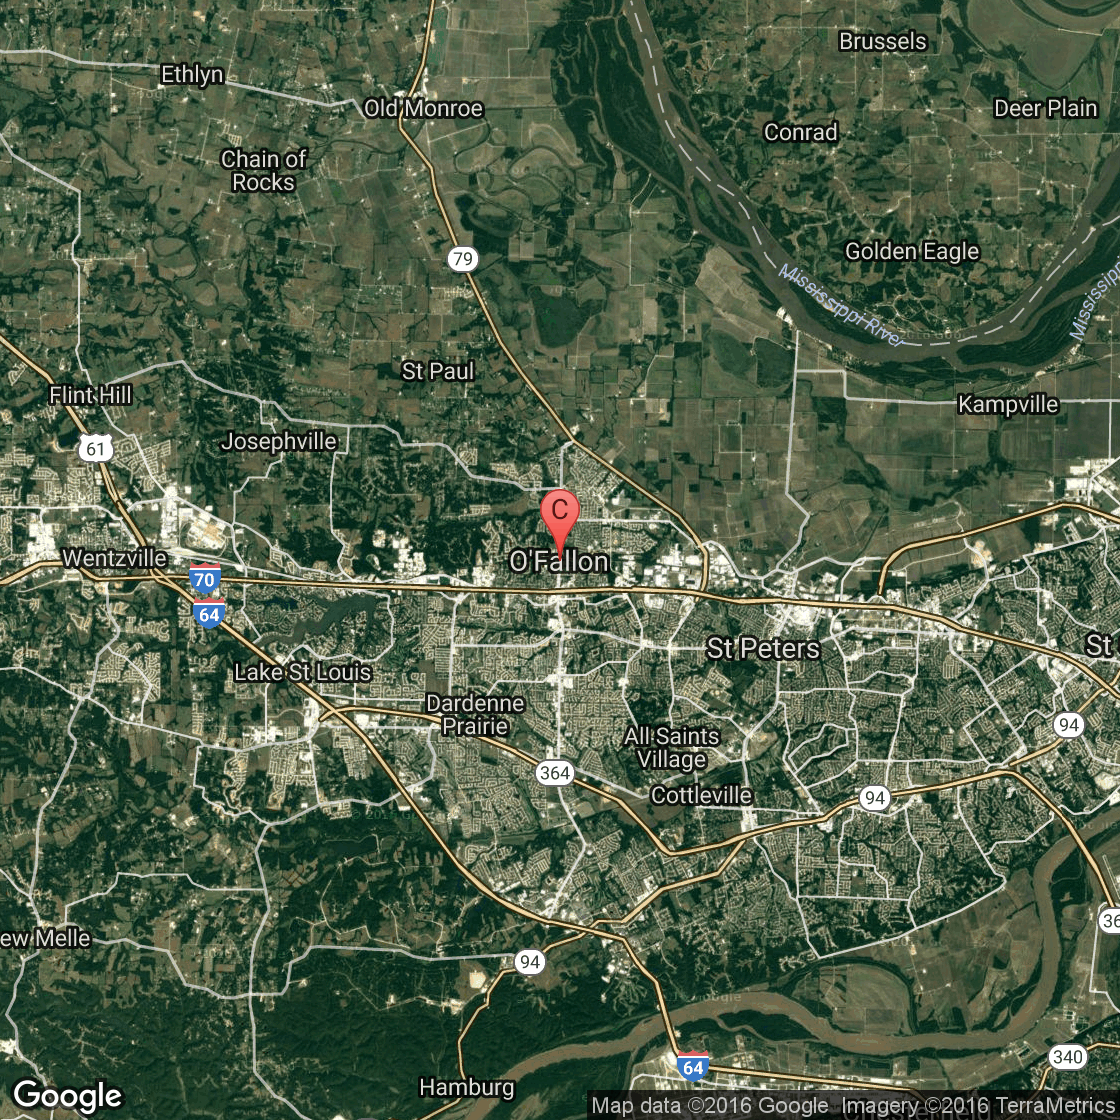 What to Do in O'Fallon, Illinois   USA Today Illinois Map Of Brussels on mount zion illinois, hardin illinois, naples illinois, phoenix illinois, burnt prairie illinois, zurich illinois, brighton illinois, springfield illinois, la salle illinois, hanover illinois, dow illinois, columbus illinois, kampsville illinois, calhoun county illinois, venice illinois, lake villa illinois, batchtown illinois, la grange illinois, united states illinois, lima illinois,